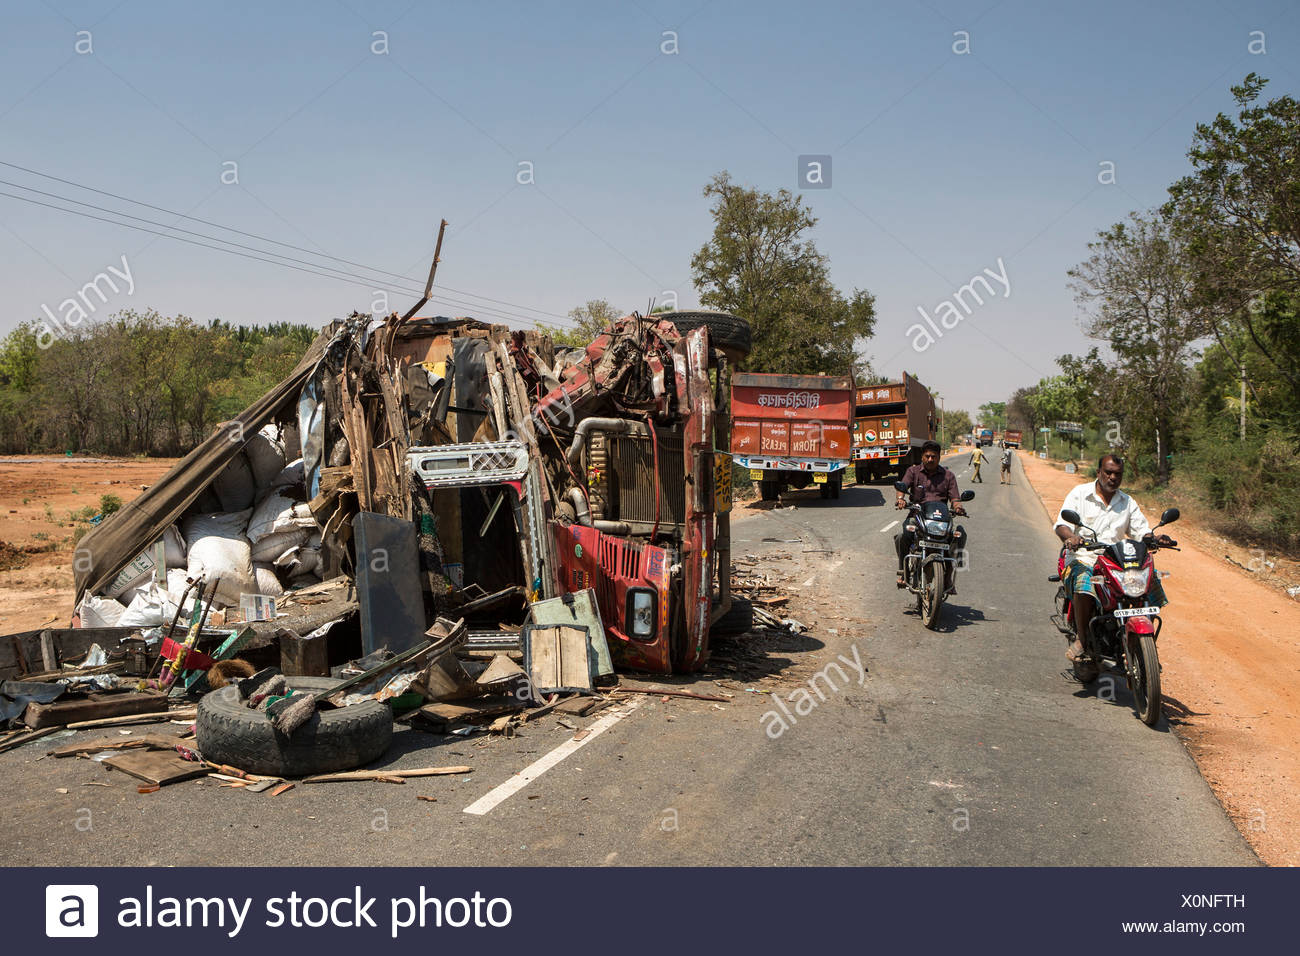 India, South India, Asia, Karnataka, road, accident, danger, truck - Stock Image